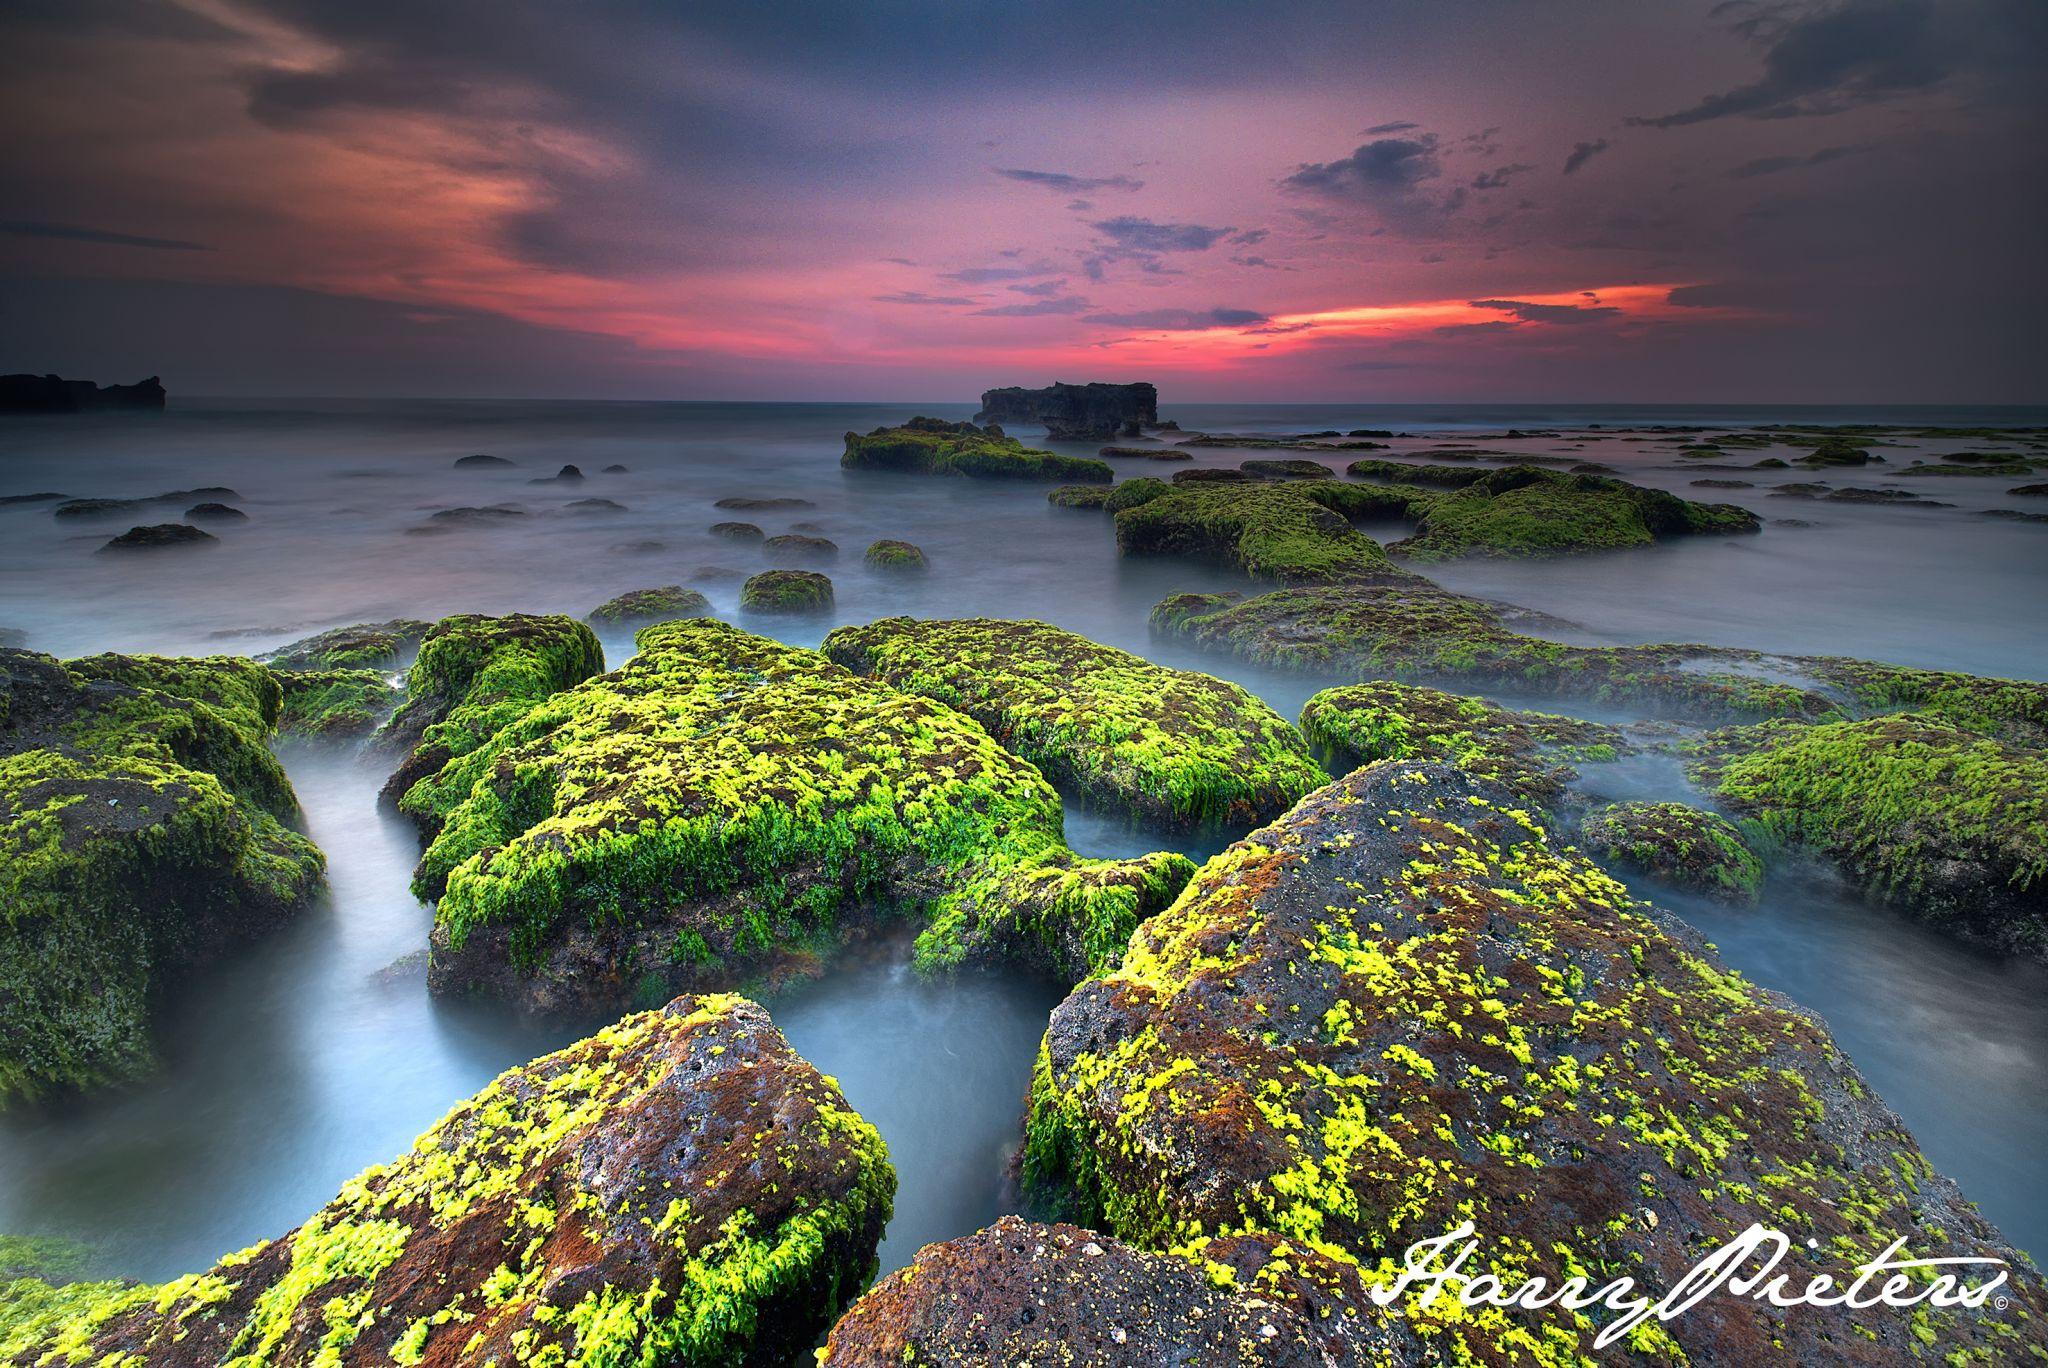 Mengening Rocks, Indonesia